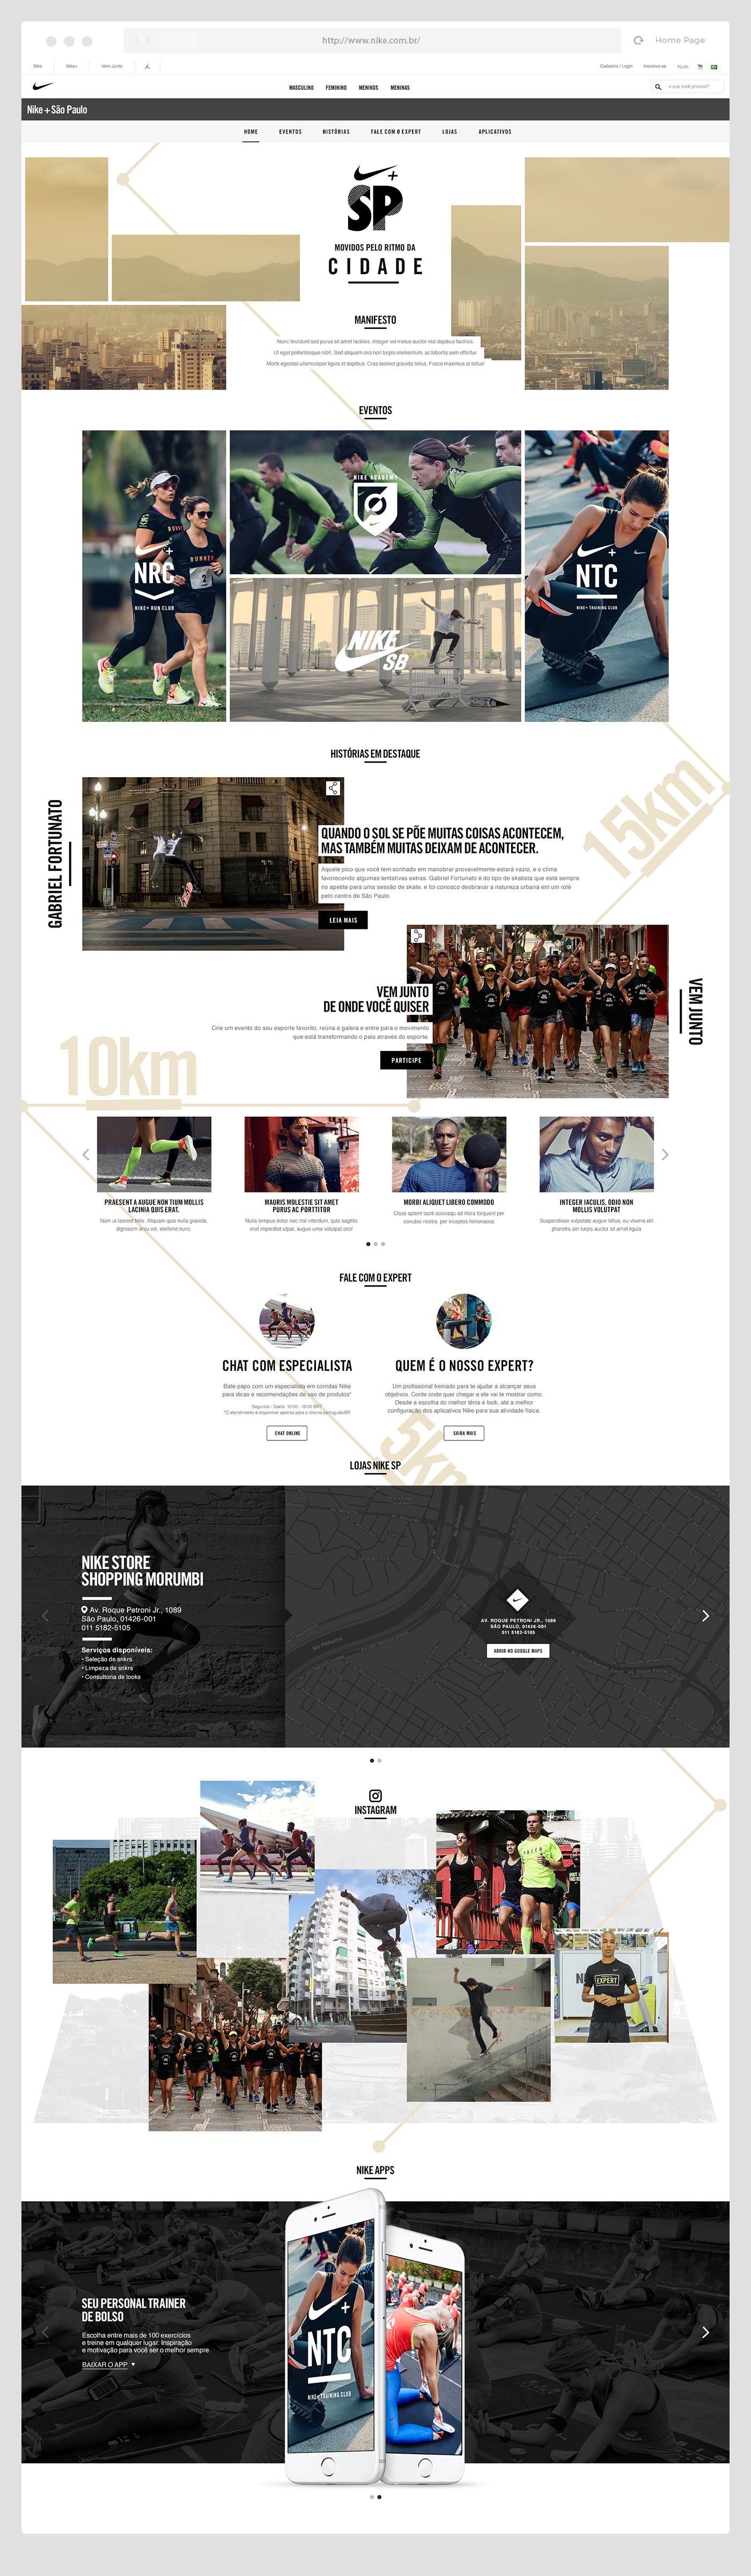 Nike Nike City são paulo vancouver british columbia nike.com Web mobile clean Nike.com.br